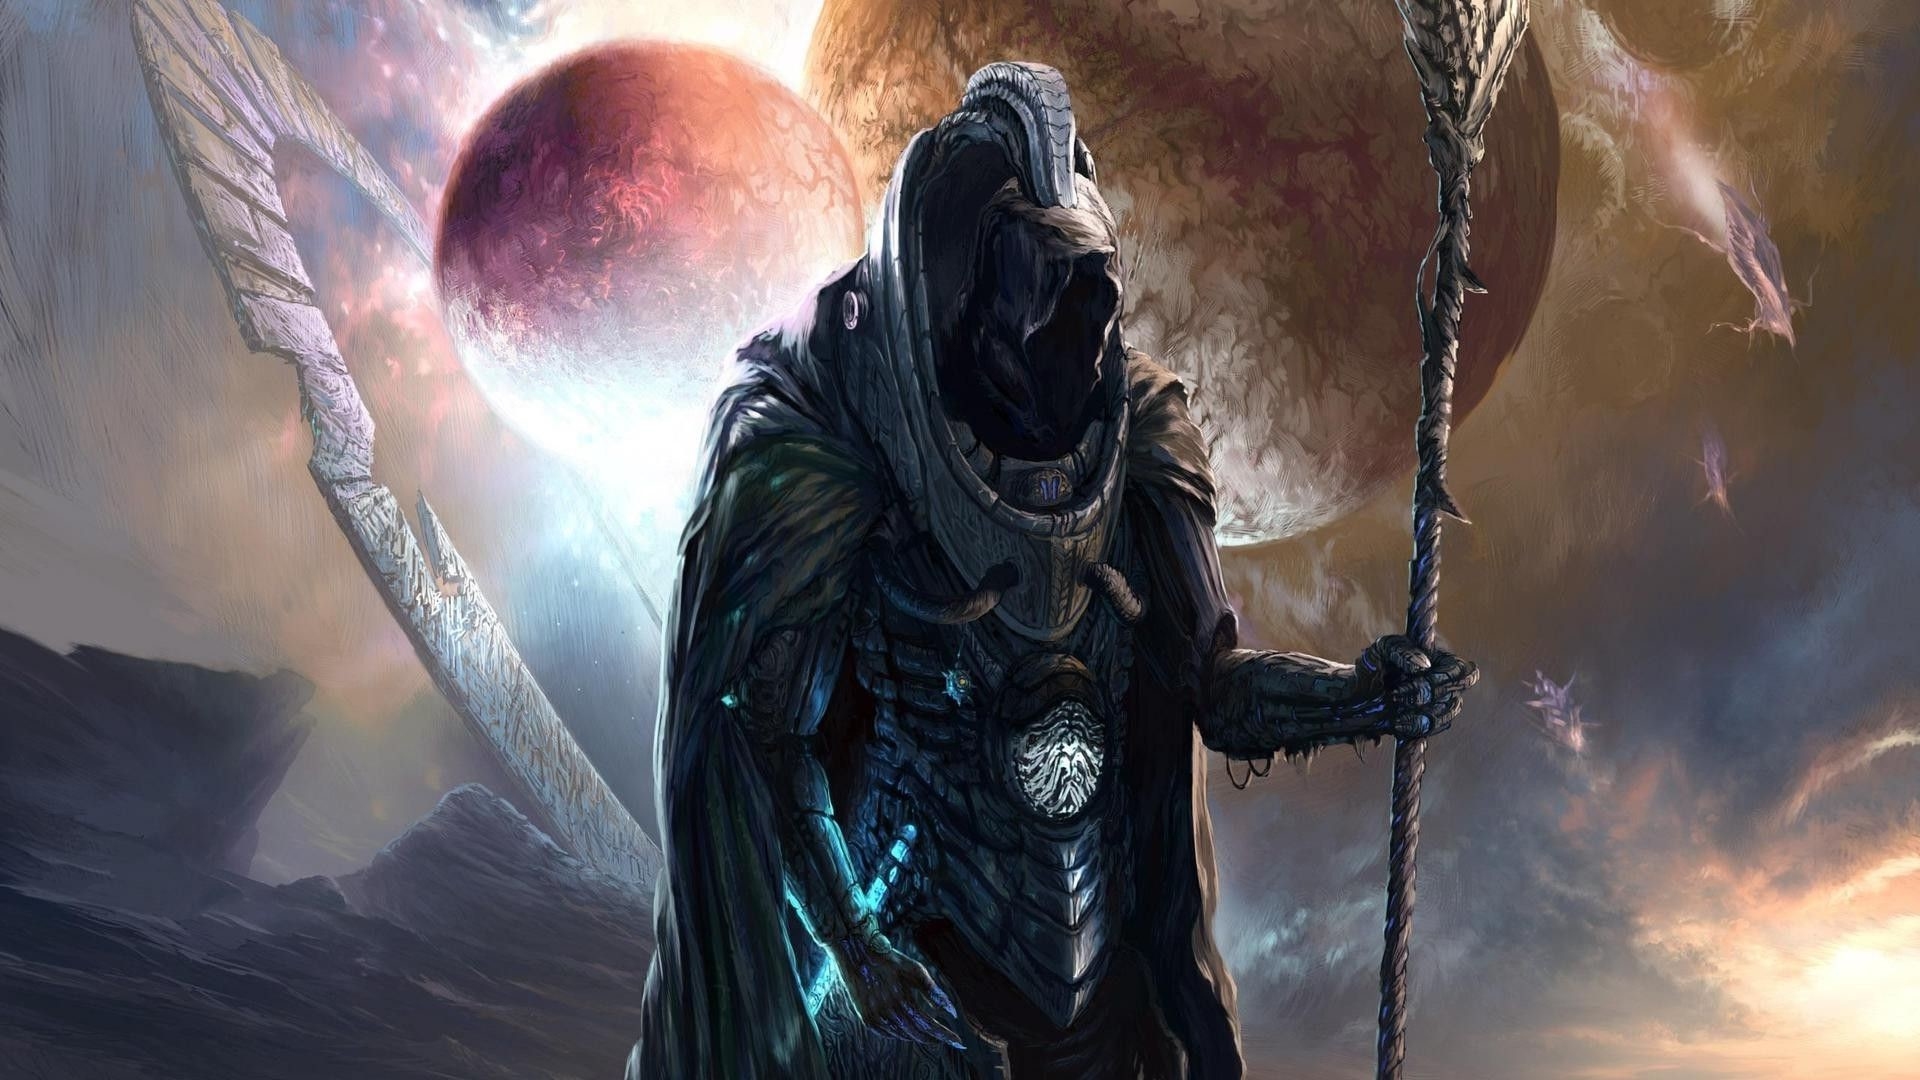 Badass Grim Reaper Wallpaper 68 Images